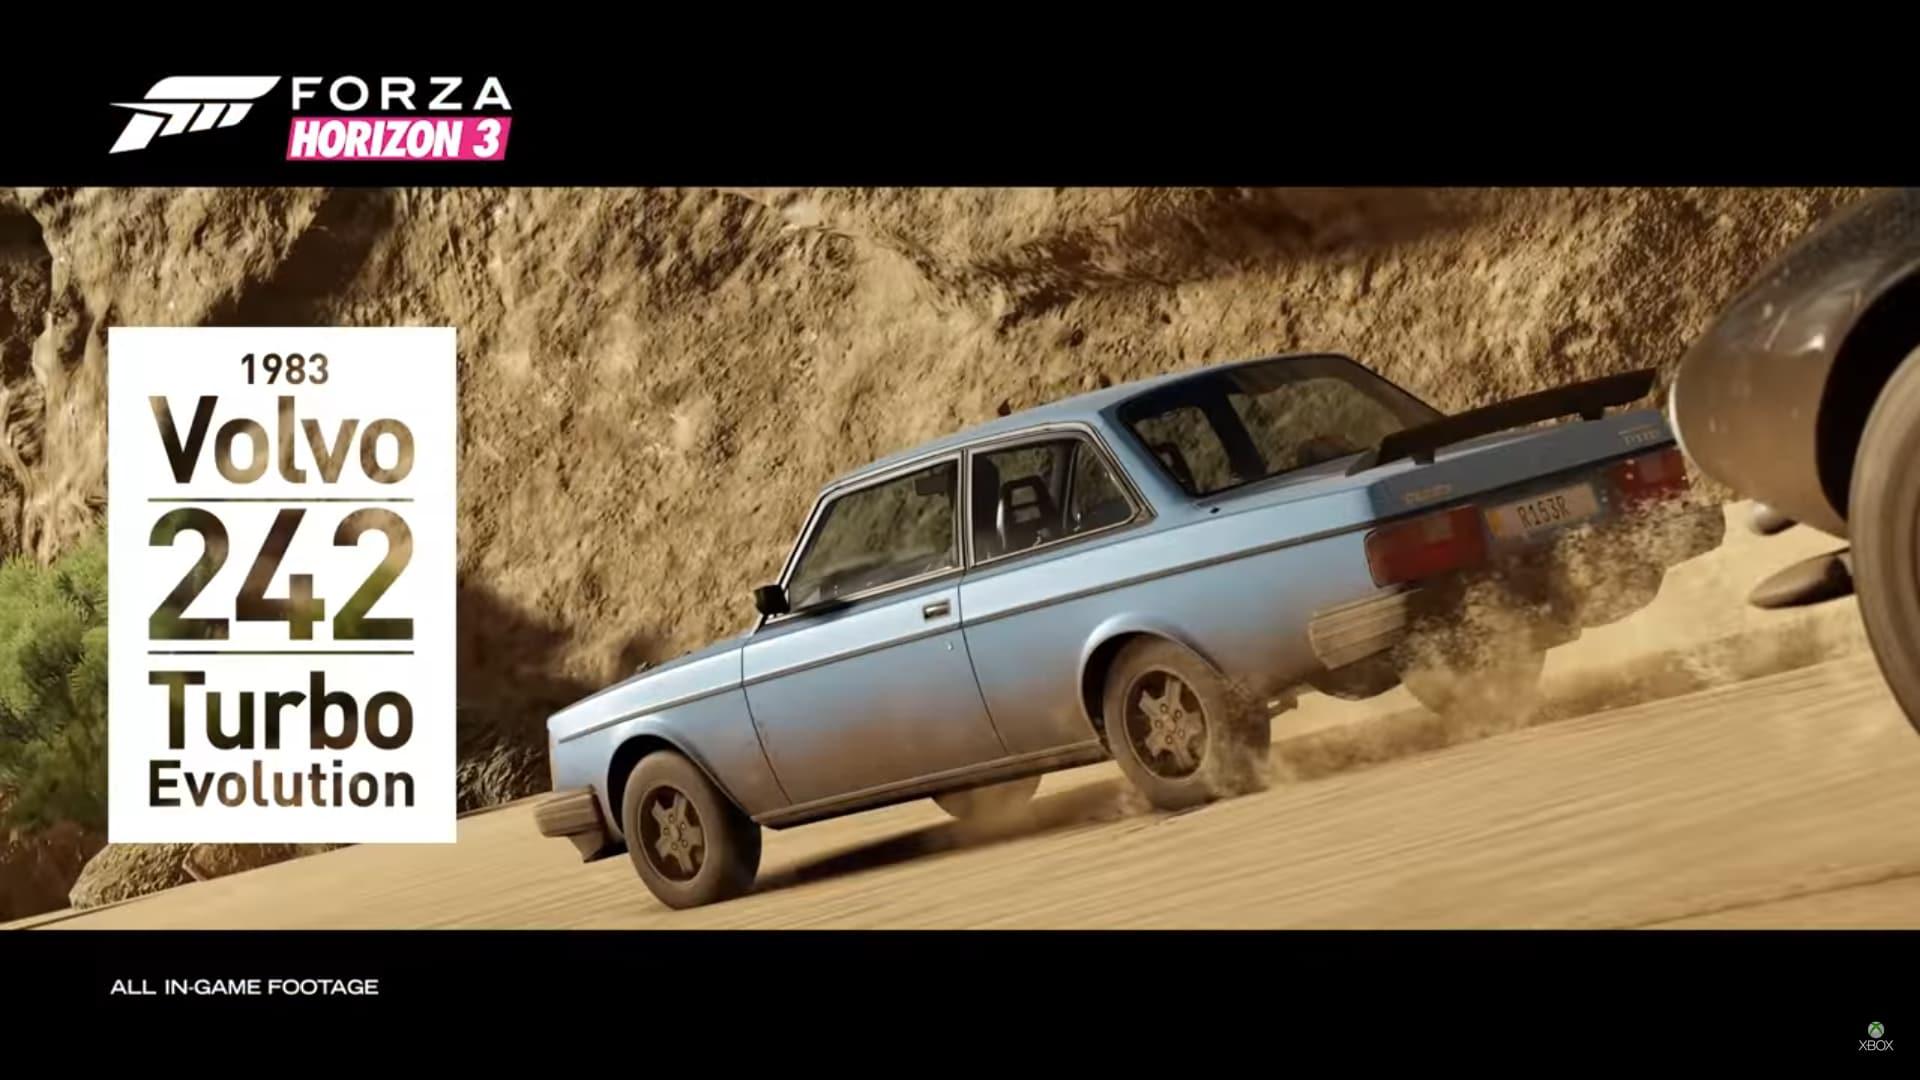 Kör en Volvo 242 i Forza Horizon 3